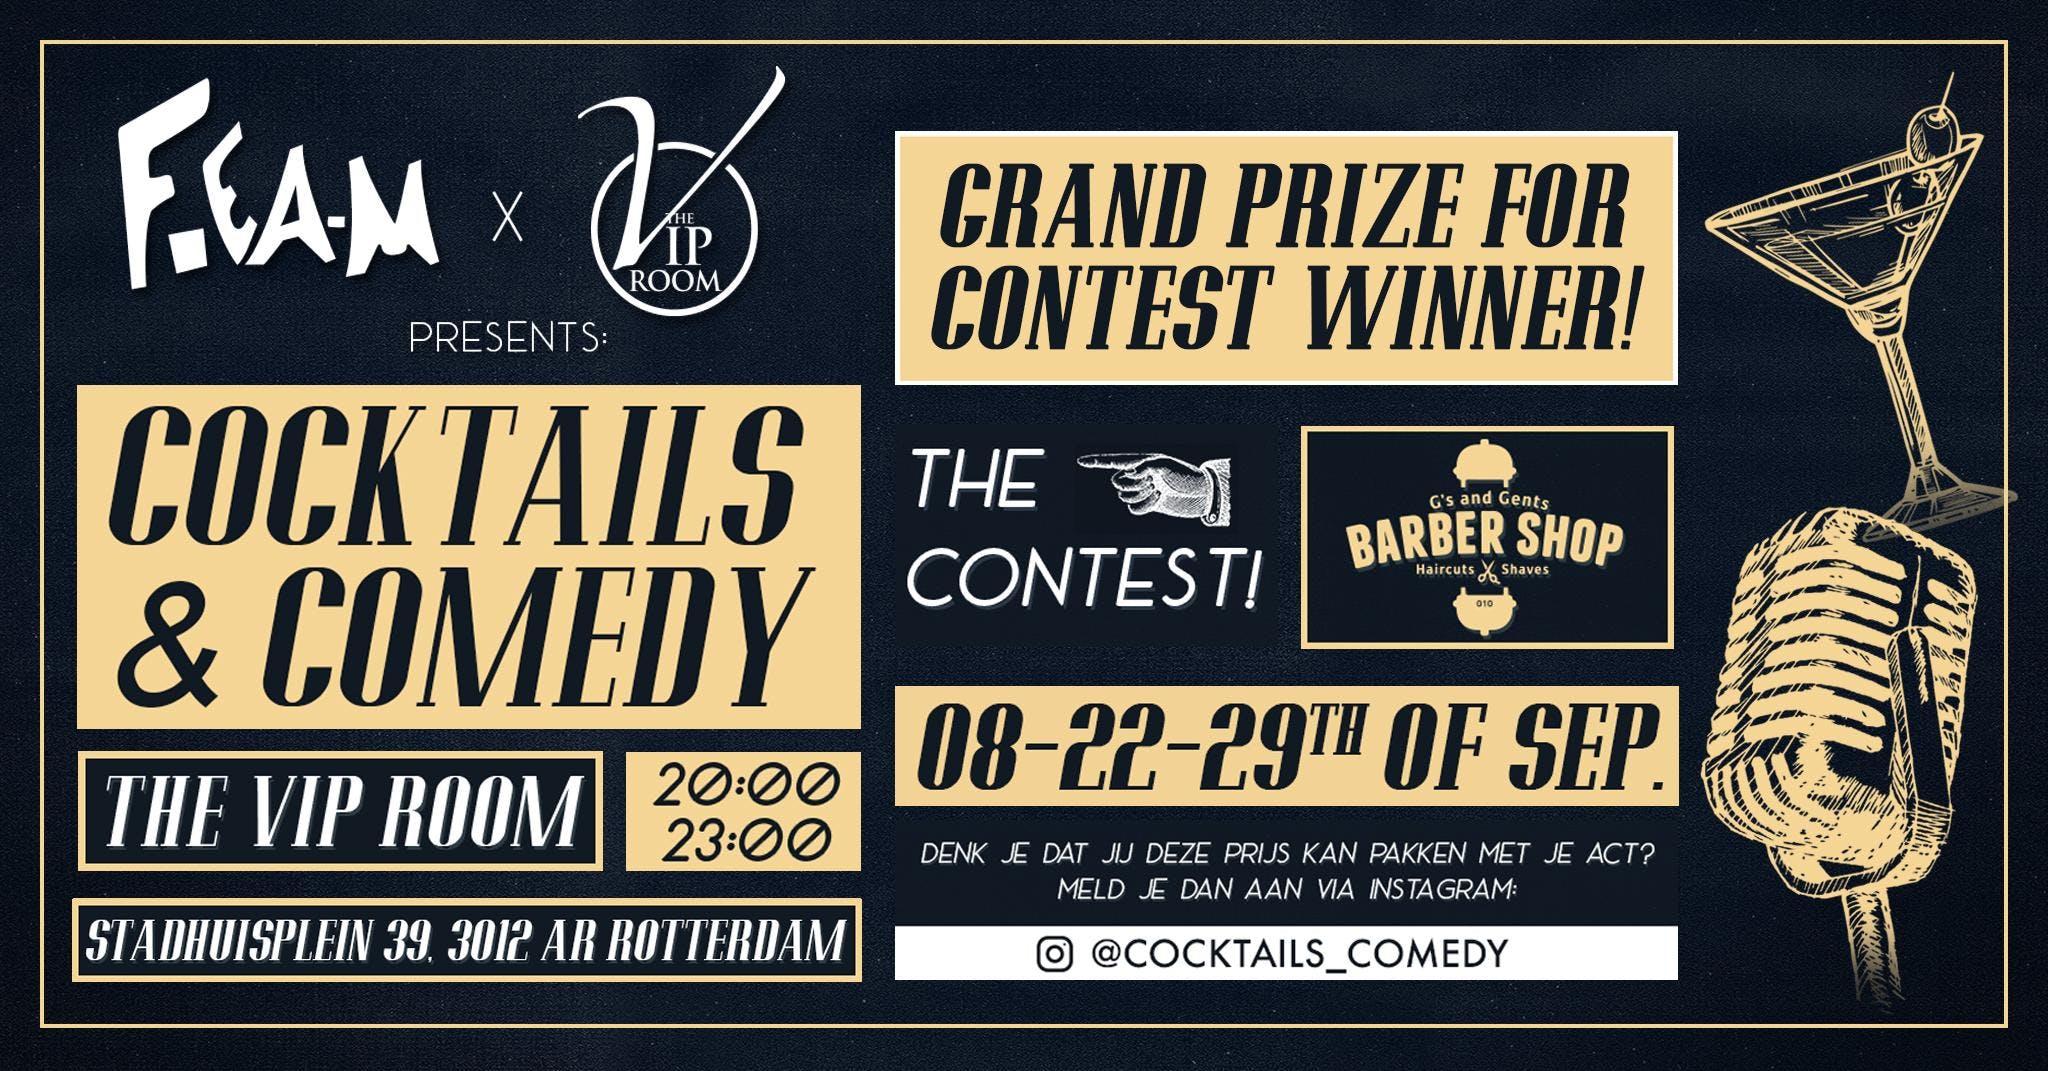 Cocktails & Comedy 22-9